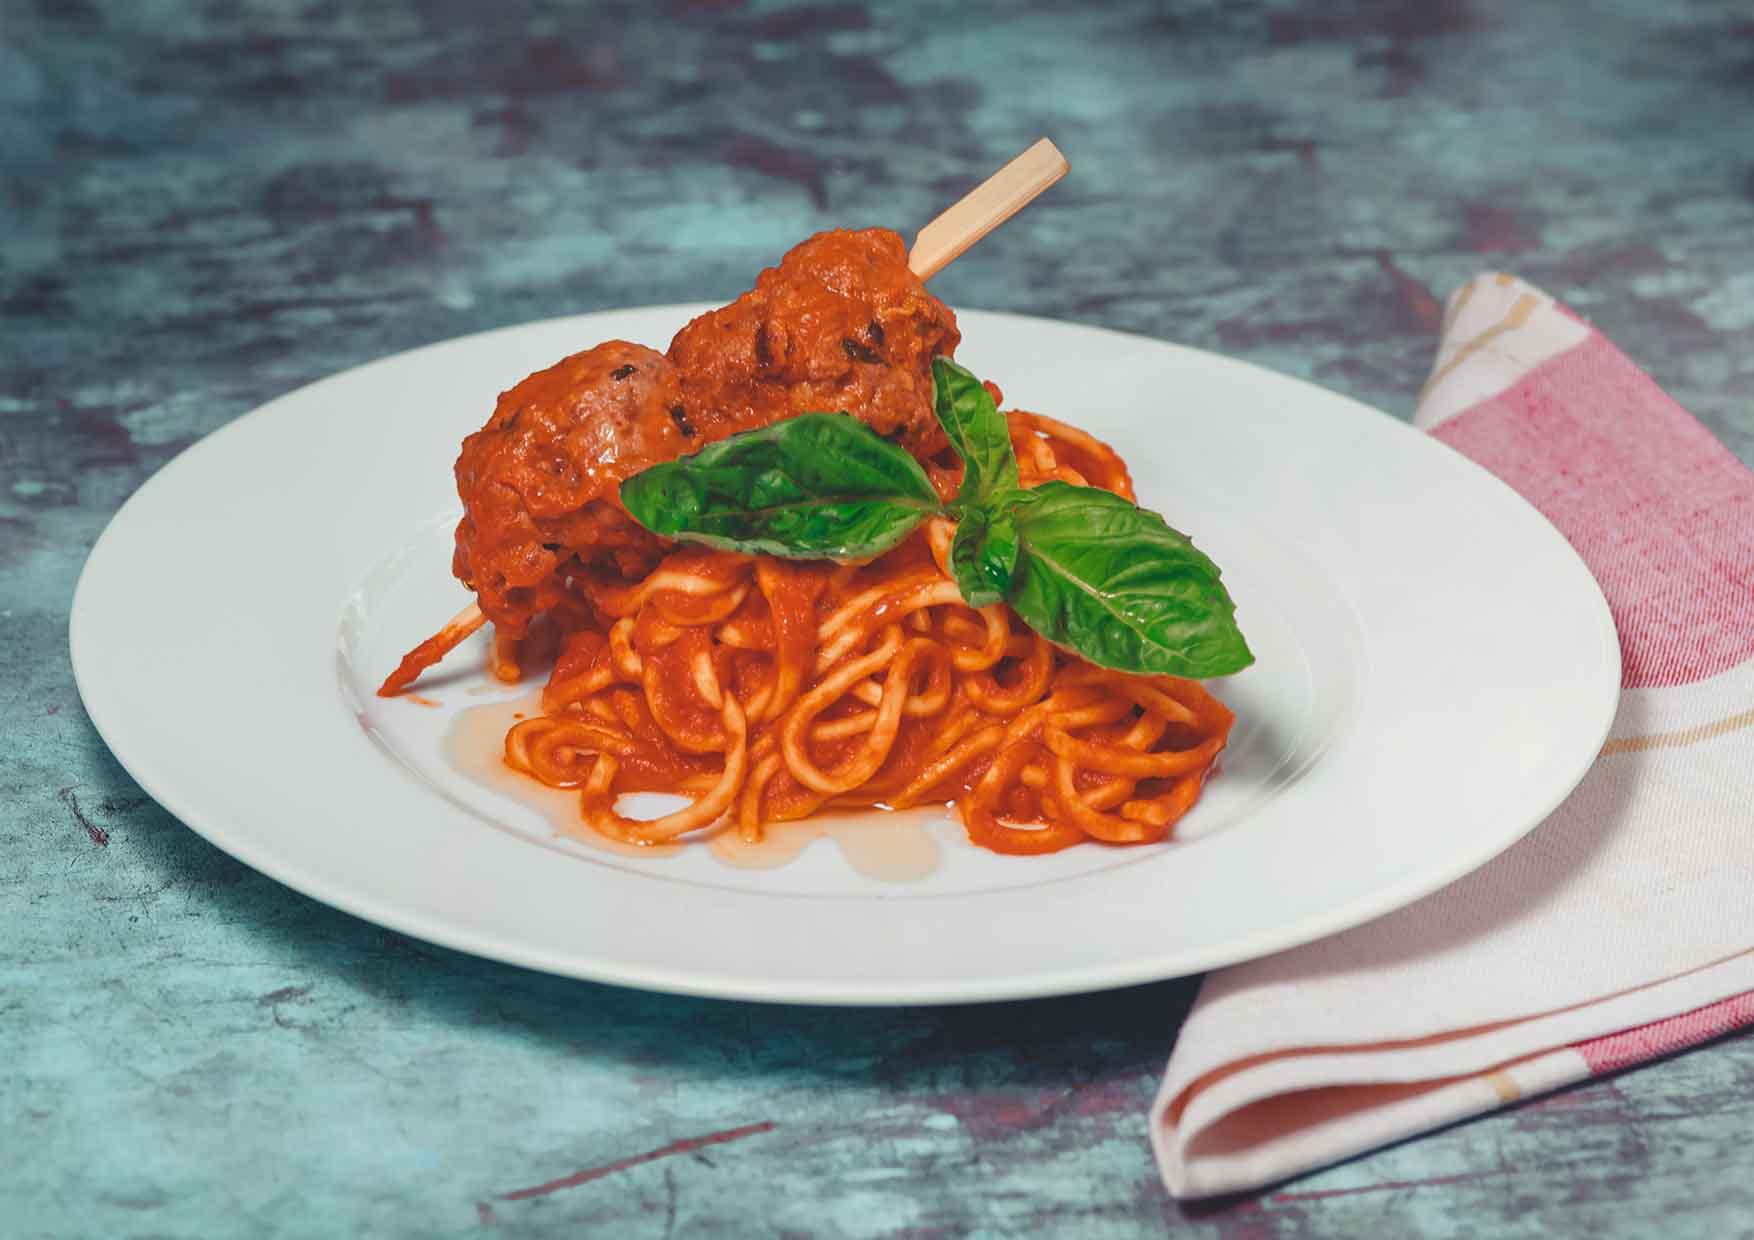 Spaghetti and Meatballs - comida para llevar - Meatpacking